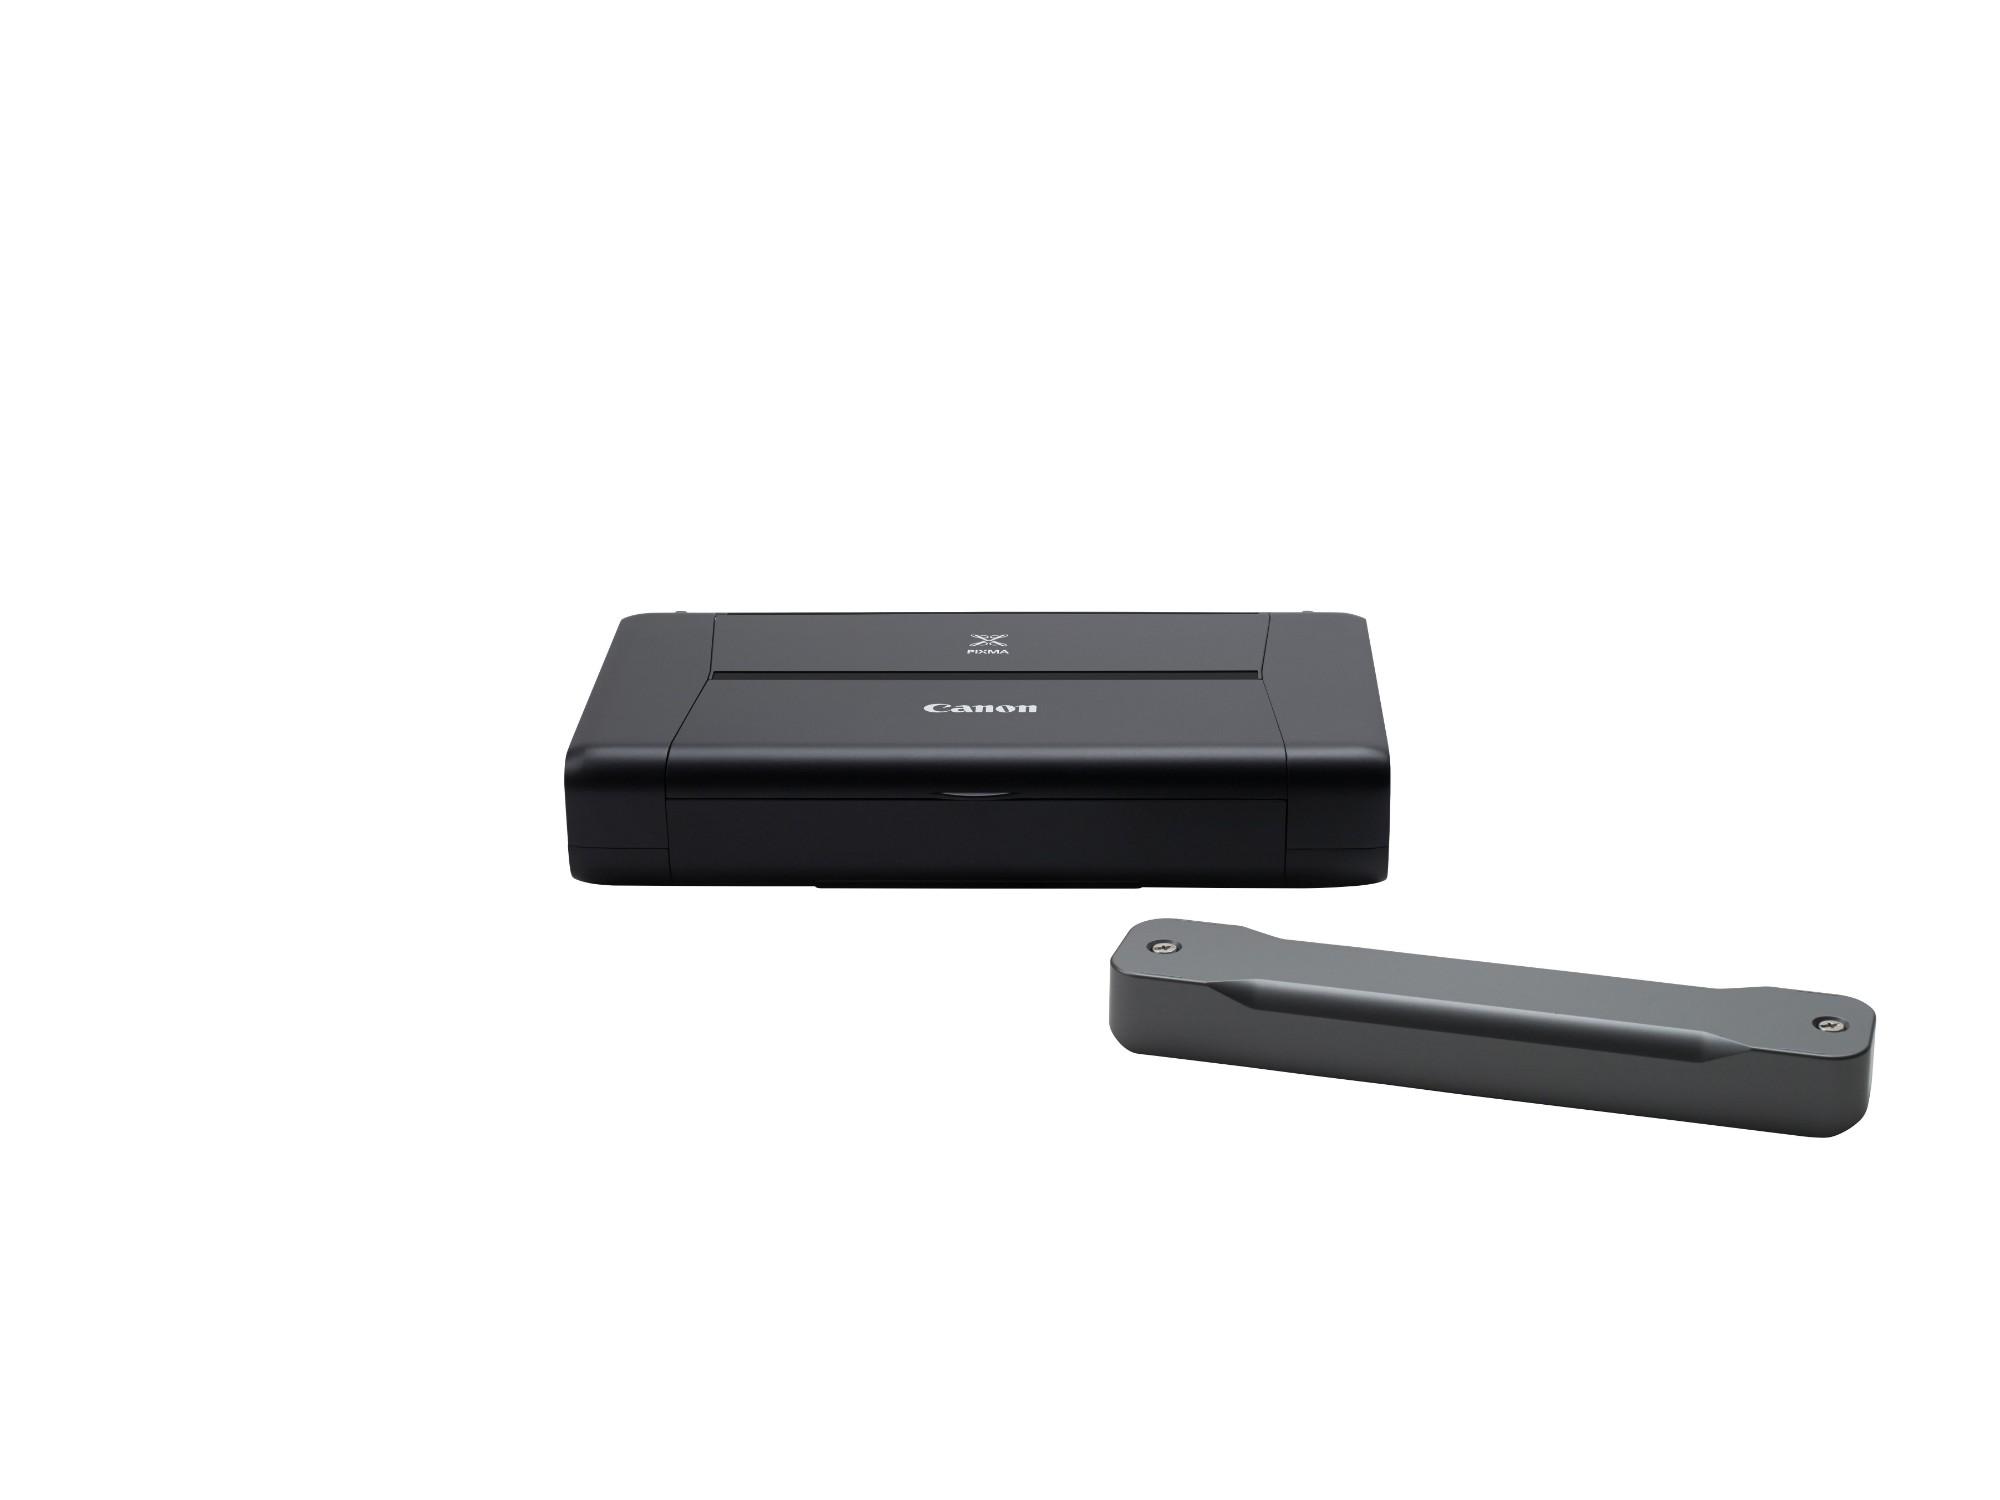 Pixma Ip110 - Color Printer - Inkjet - A4 - USB